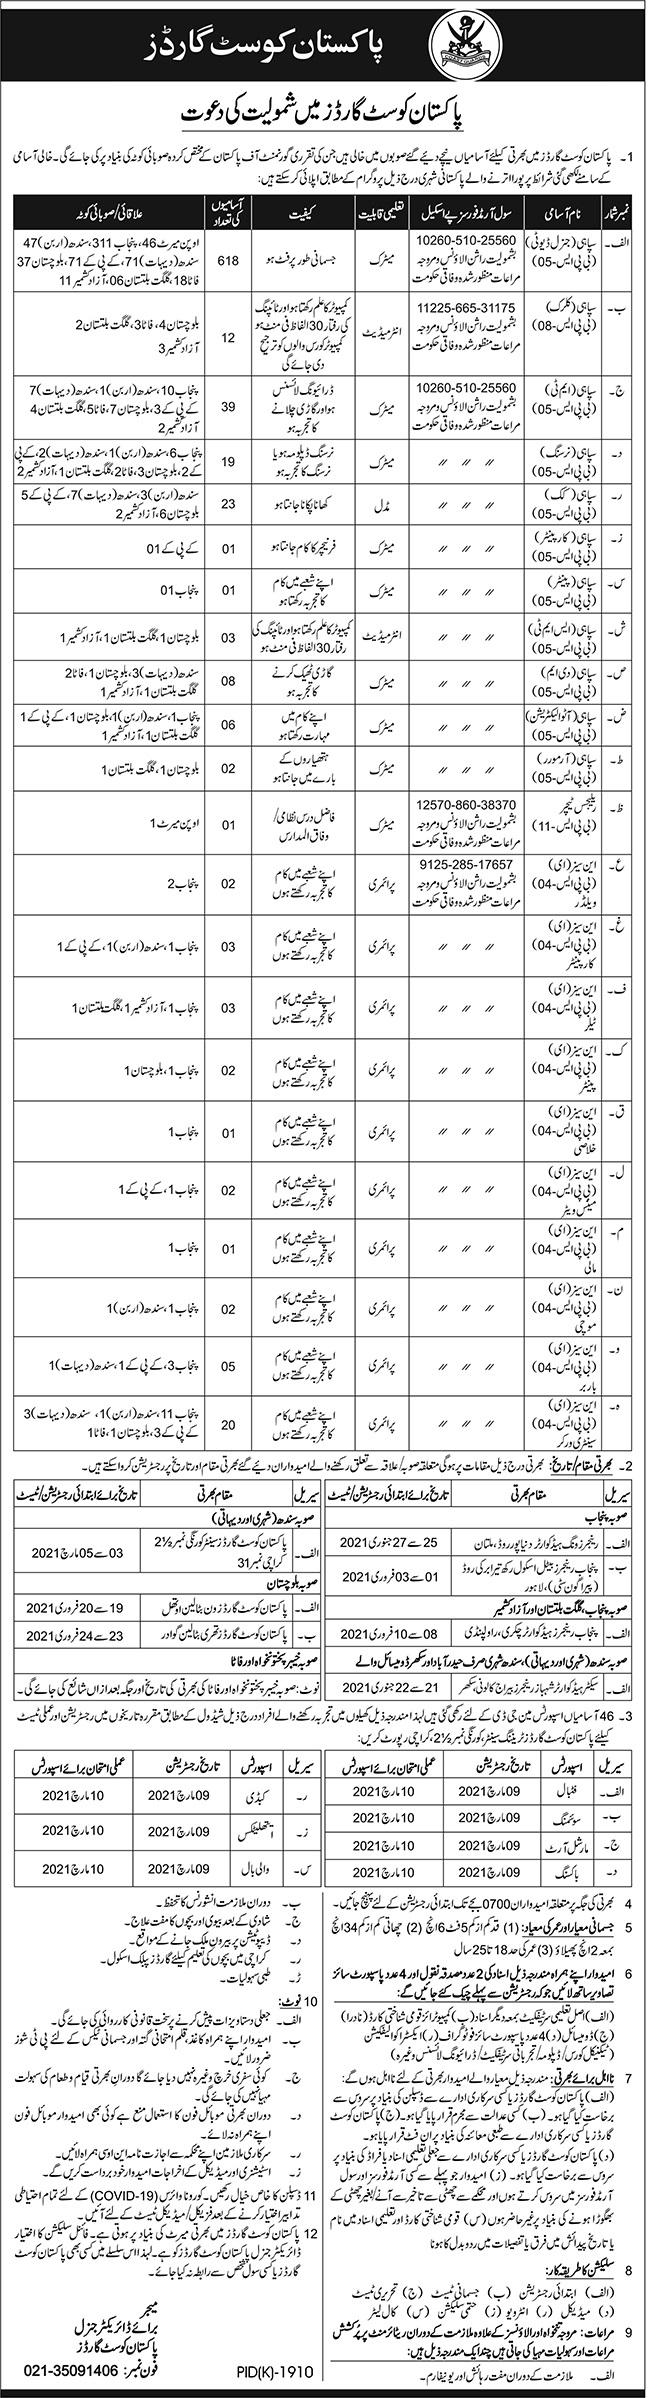 How to Join Pakistan Coast Guard Jobs 2021 - PCG Jobs 2021 - 774+ New Vacancies in Pakistan Coast Guard PCG Jobs 2021 - Coast Guard Jobs 2021